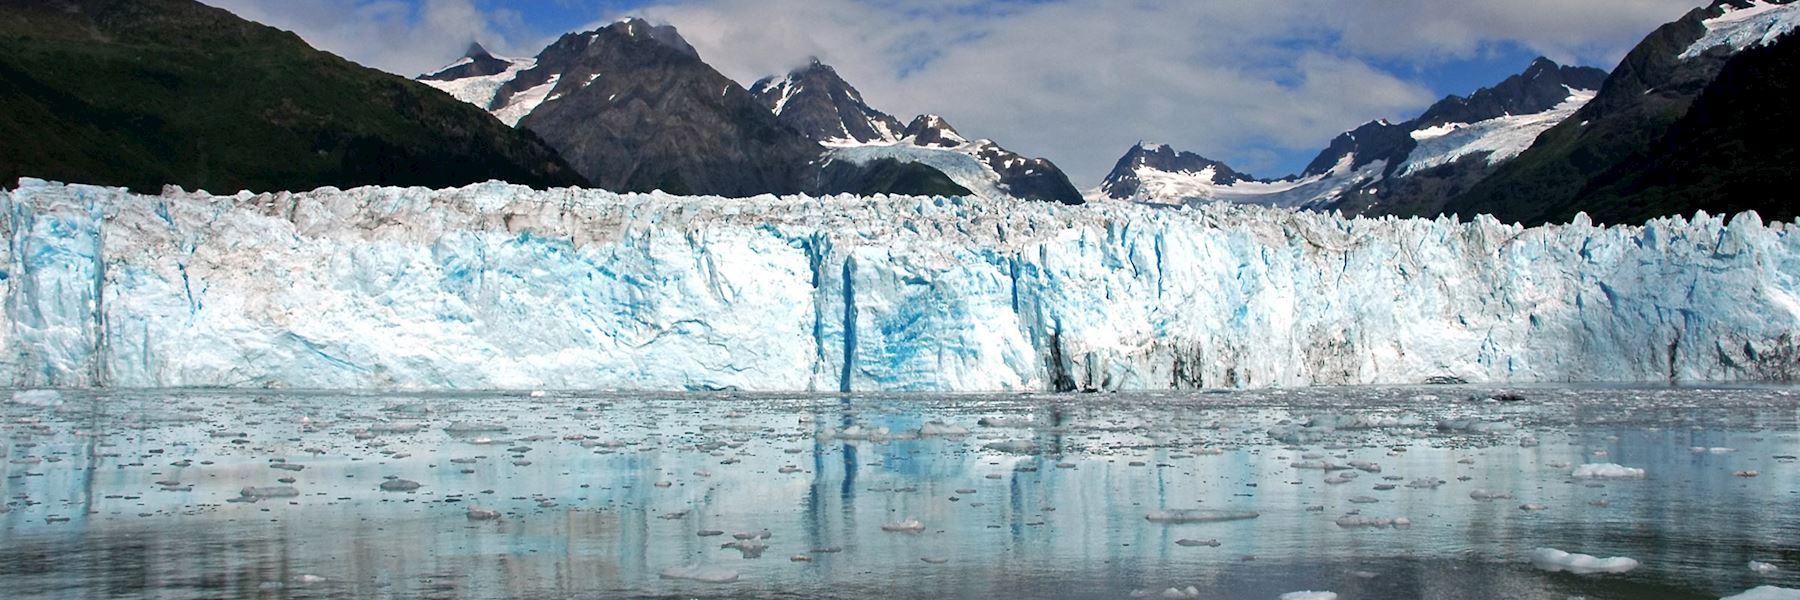 Visit Prince William Sound, Alaska